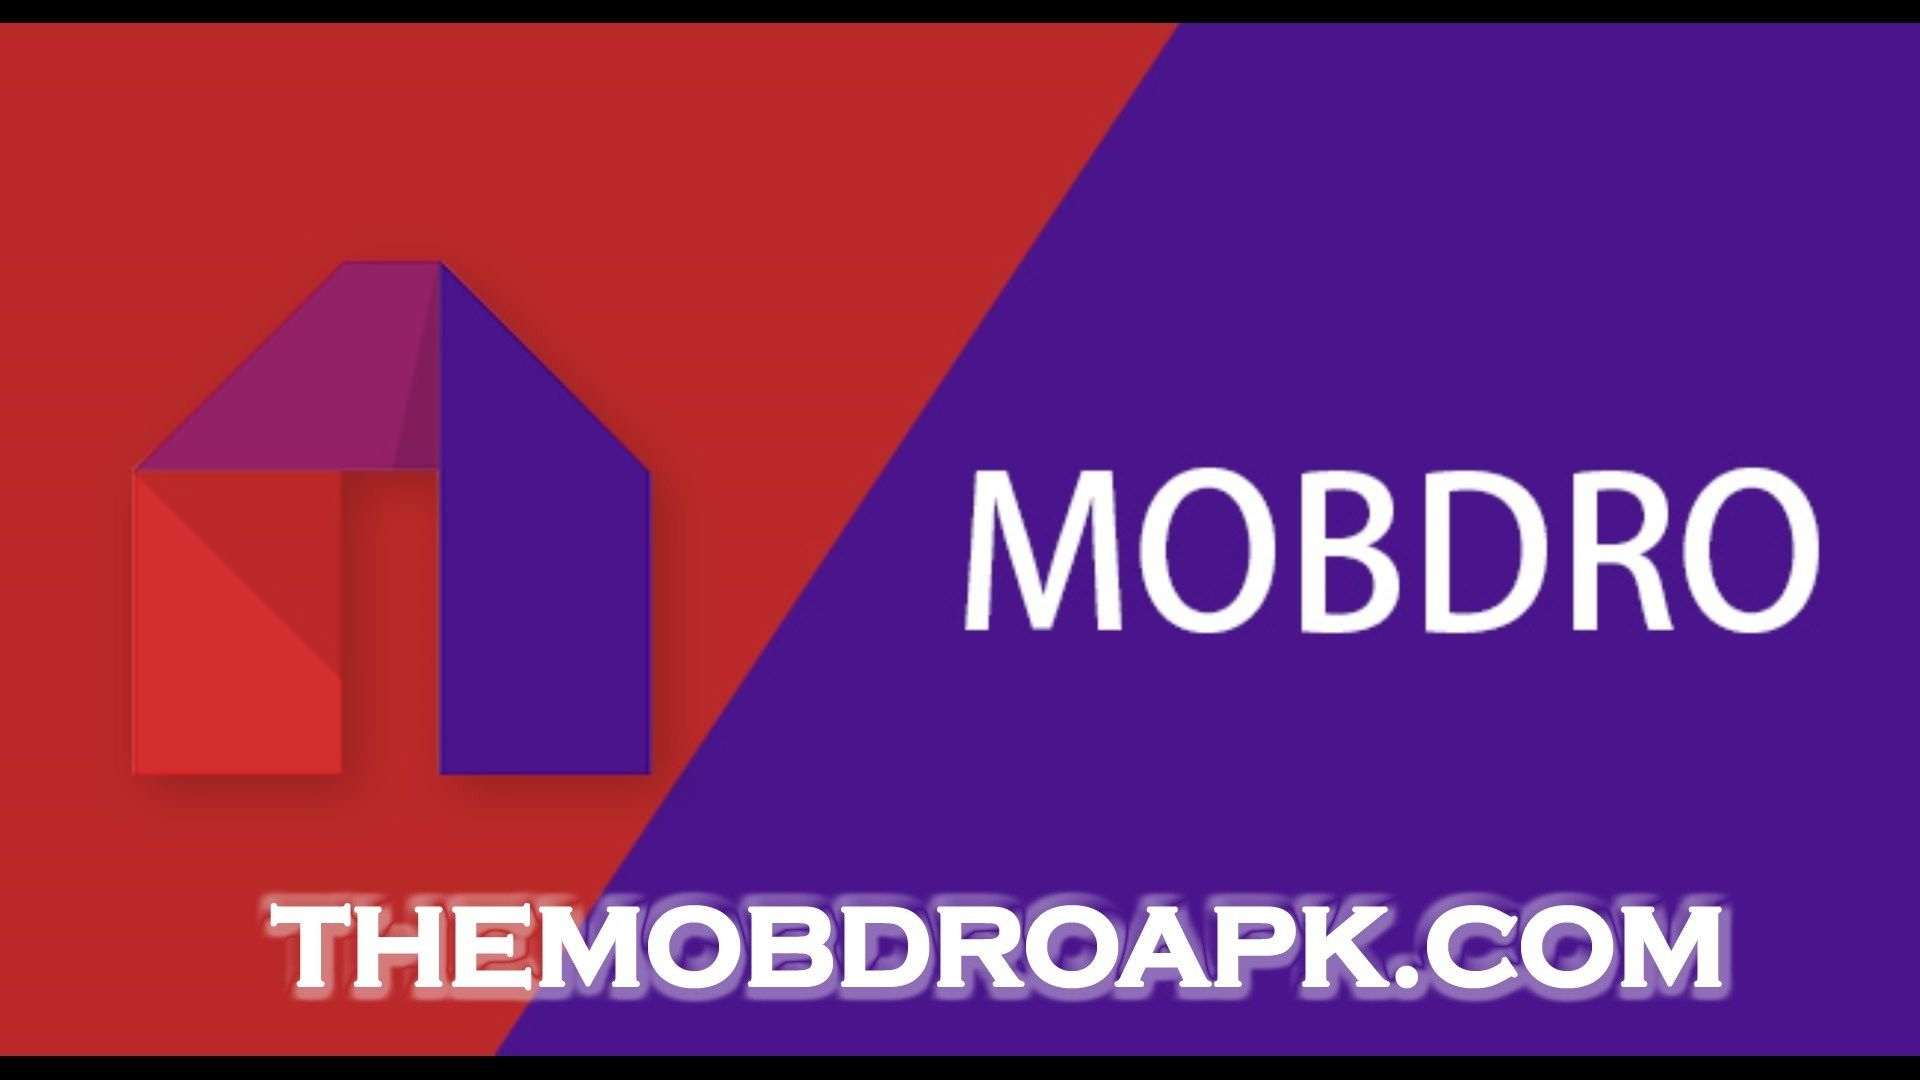 mobdroapkmirror installmobdroapp mobdroapple